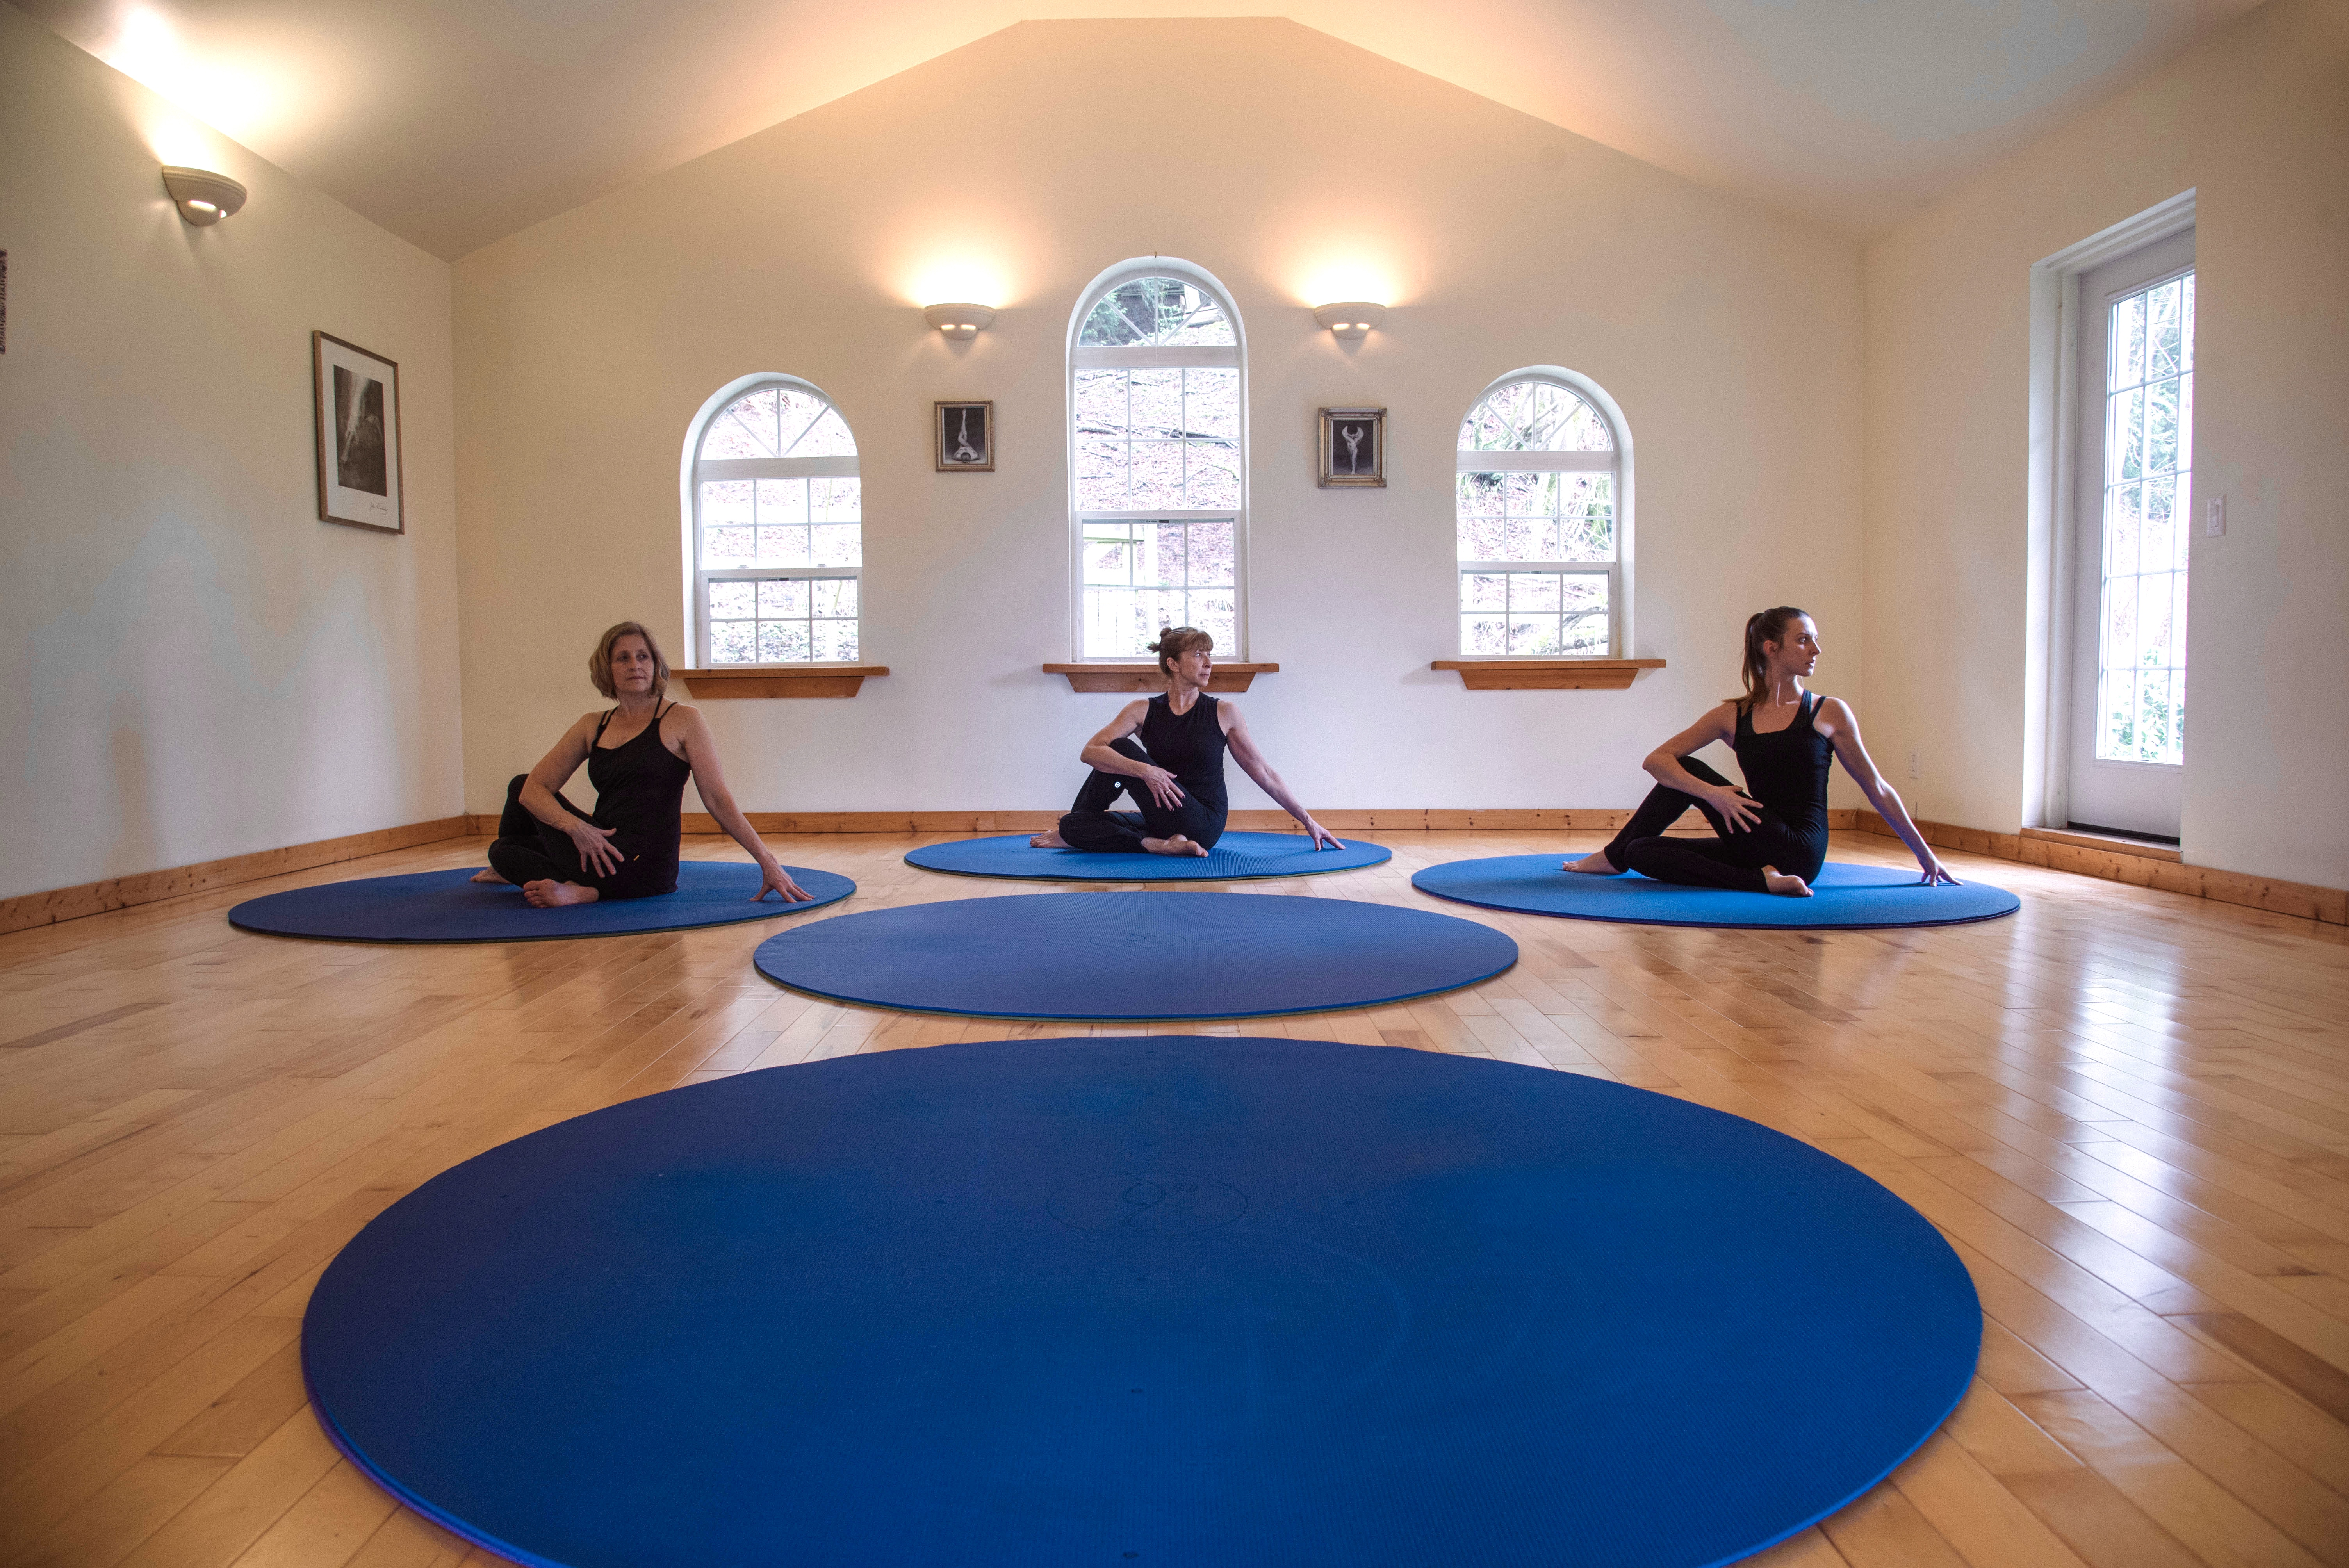 twisting on a round yoga mat